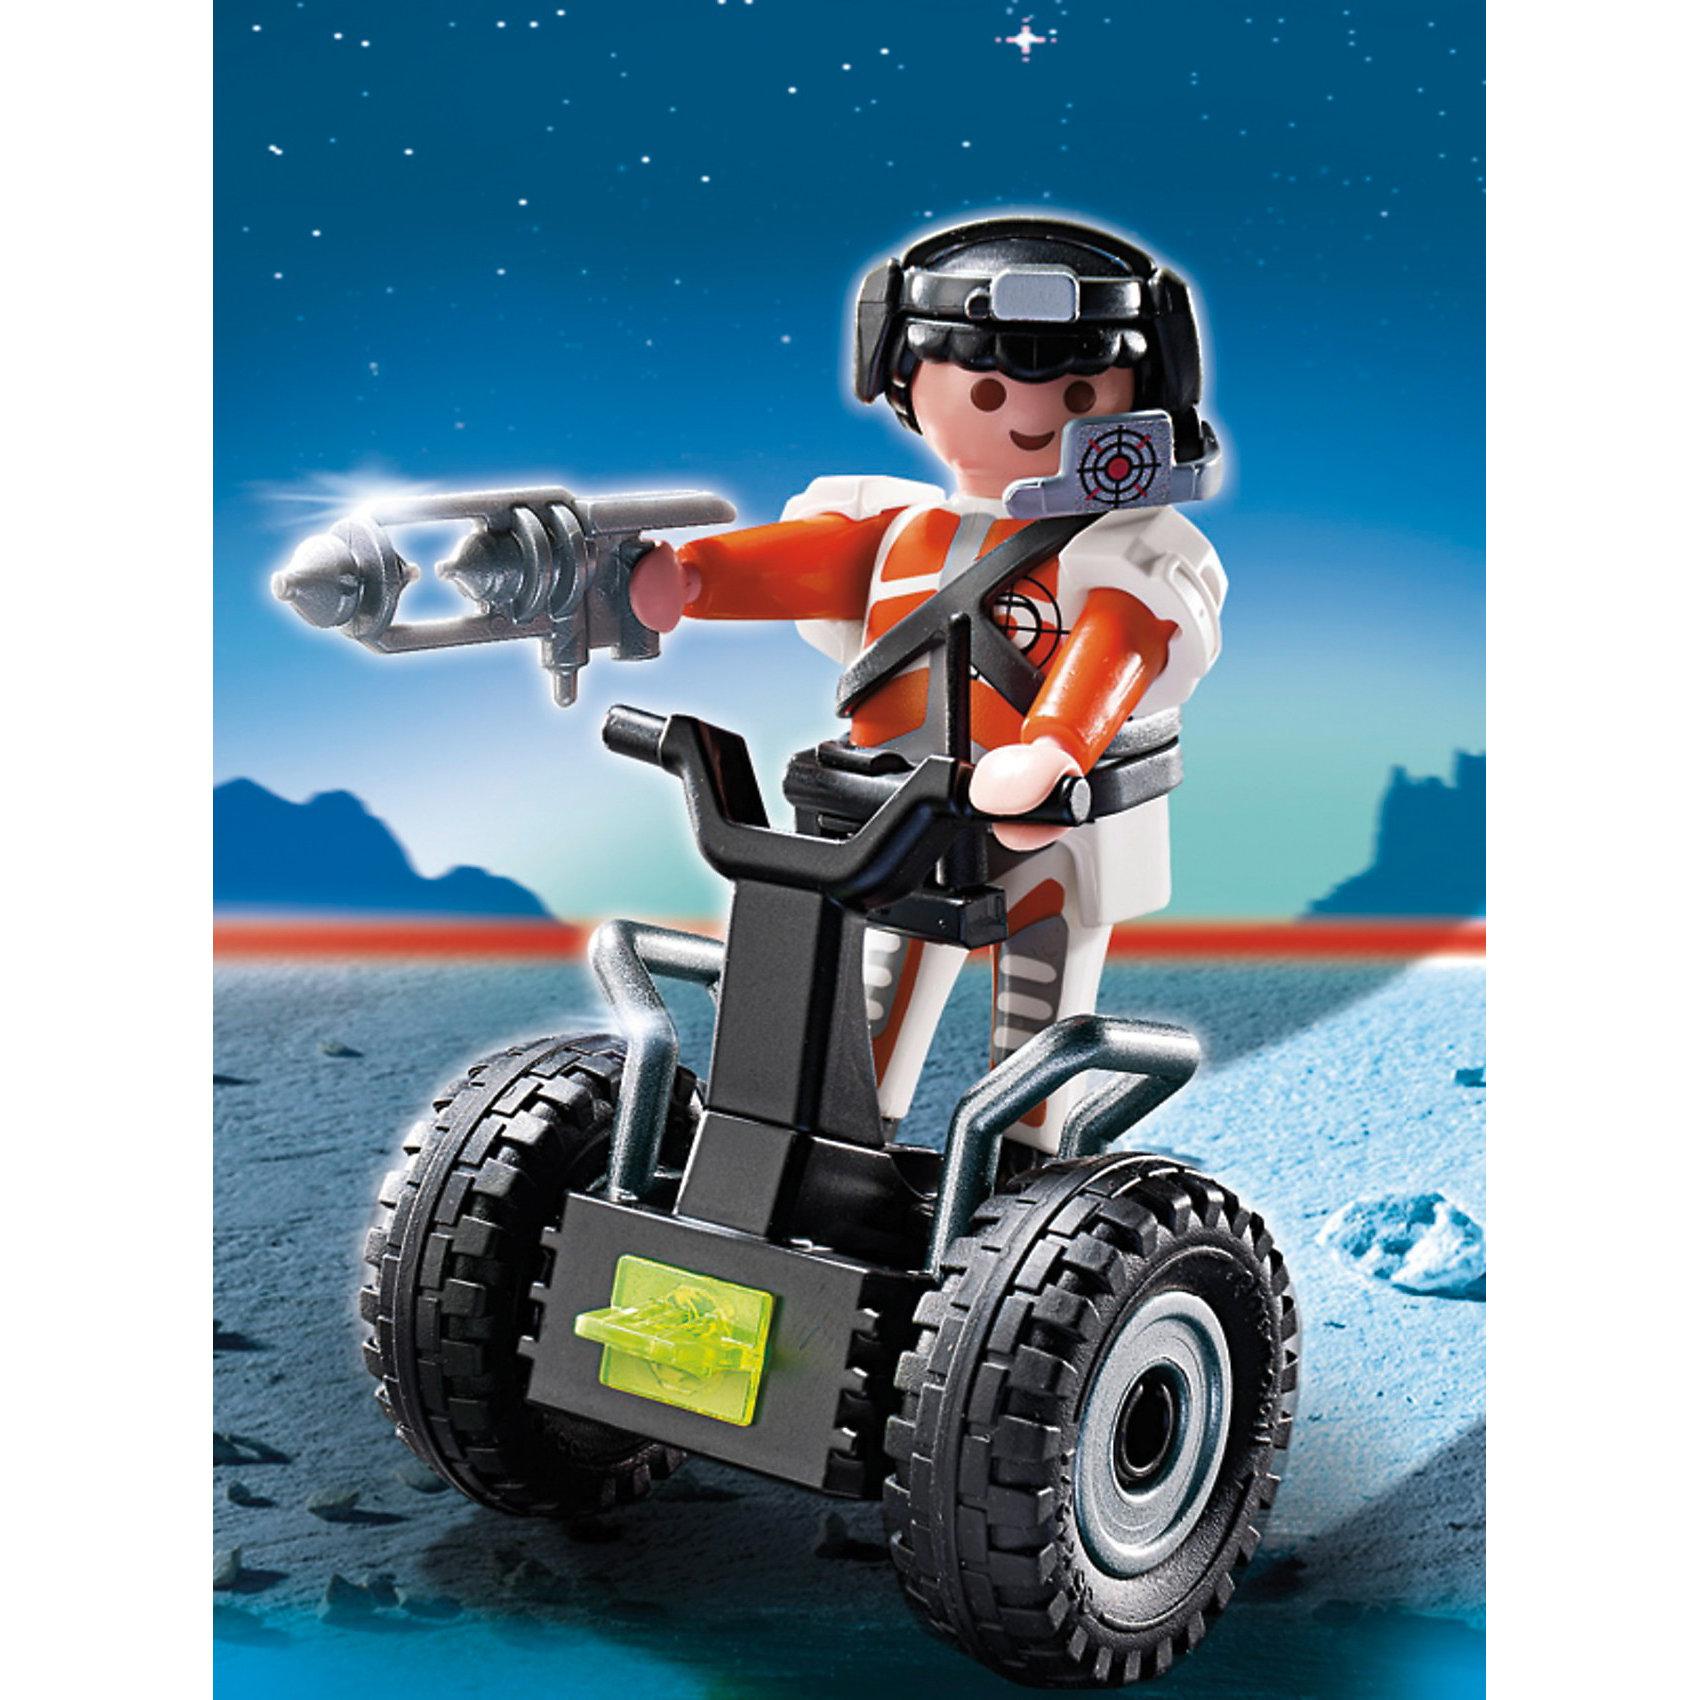 PLAYMOBIL® PLAYMOBIL  5296 Экстра-набор: Топ агент на гоночной машине playmobil® экстра набор фея с оленем playmobil